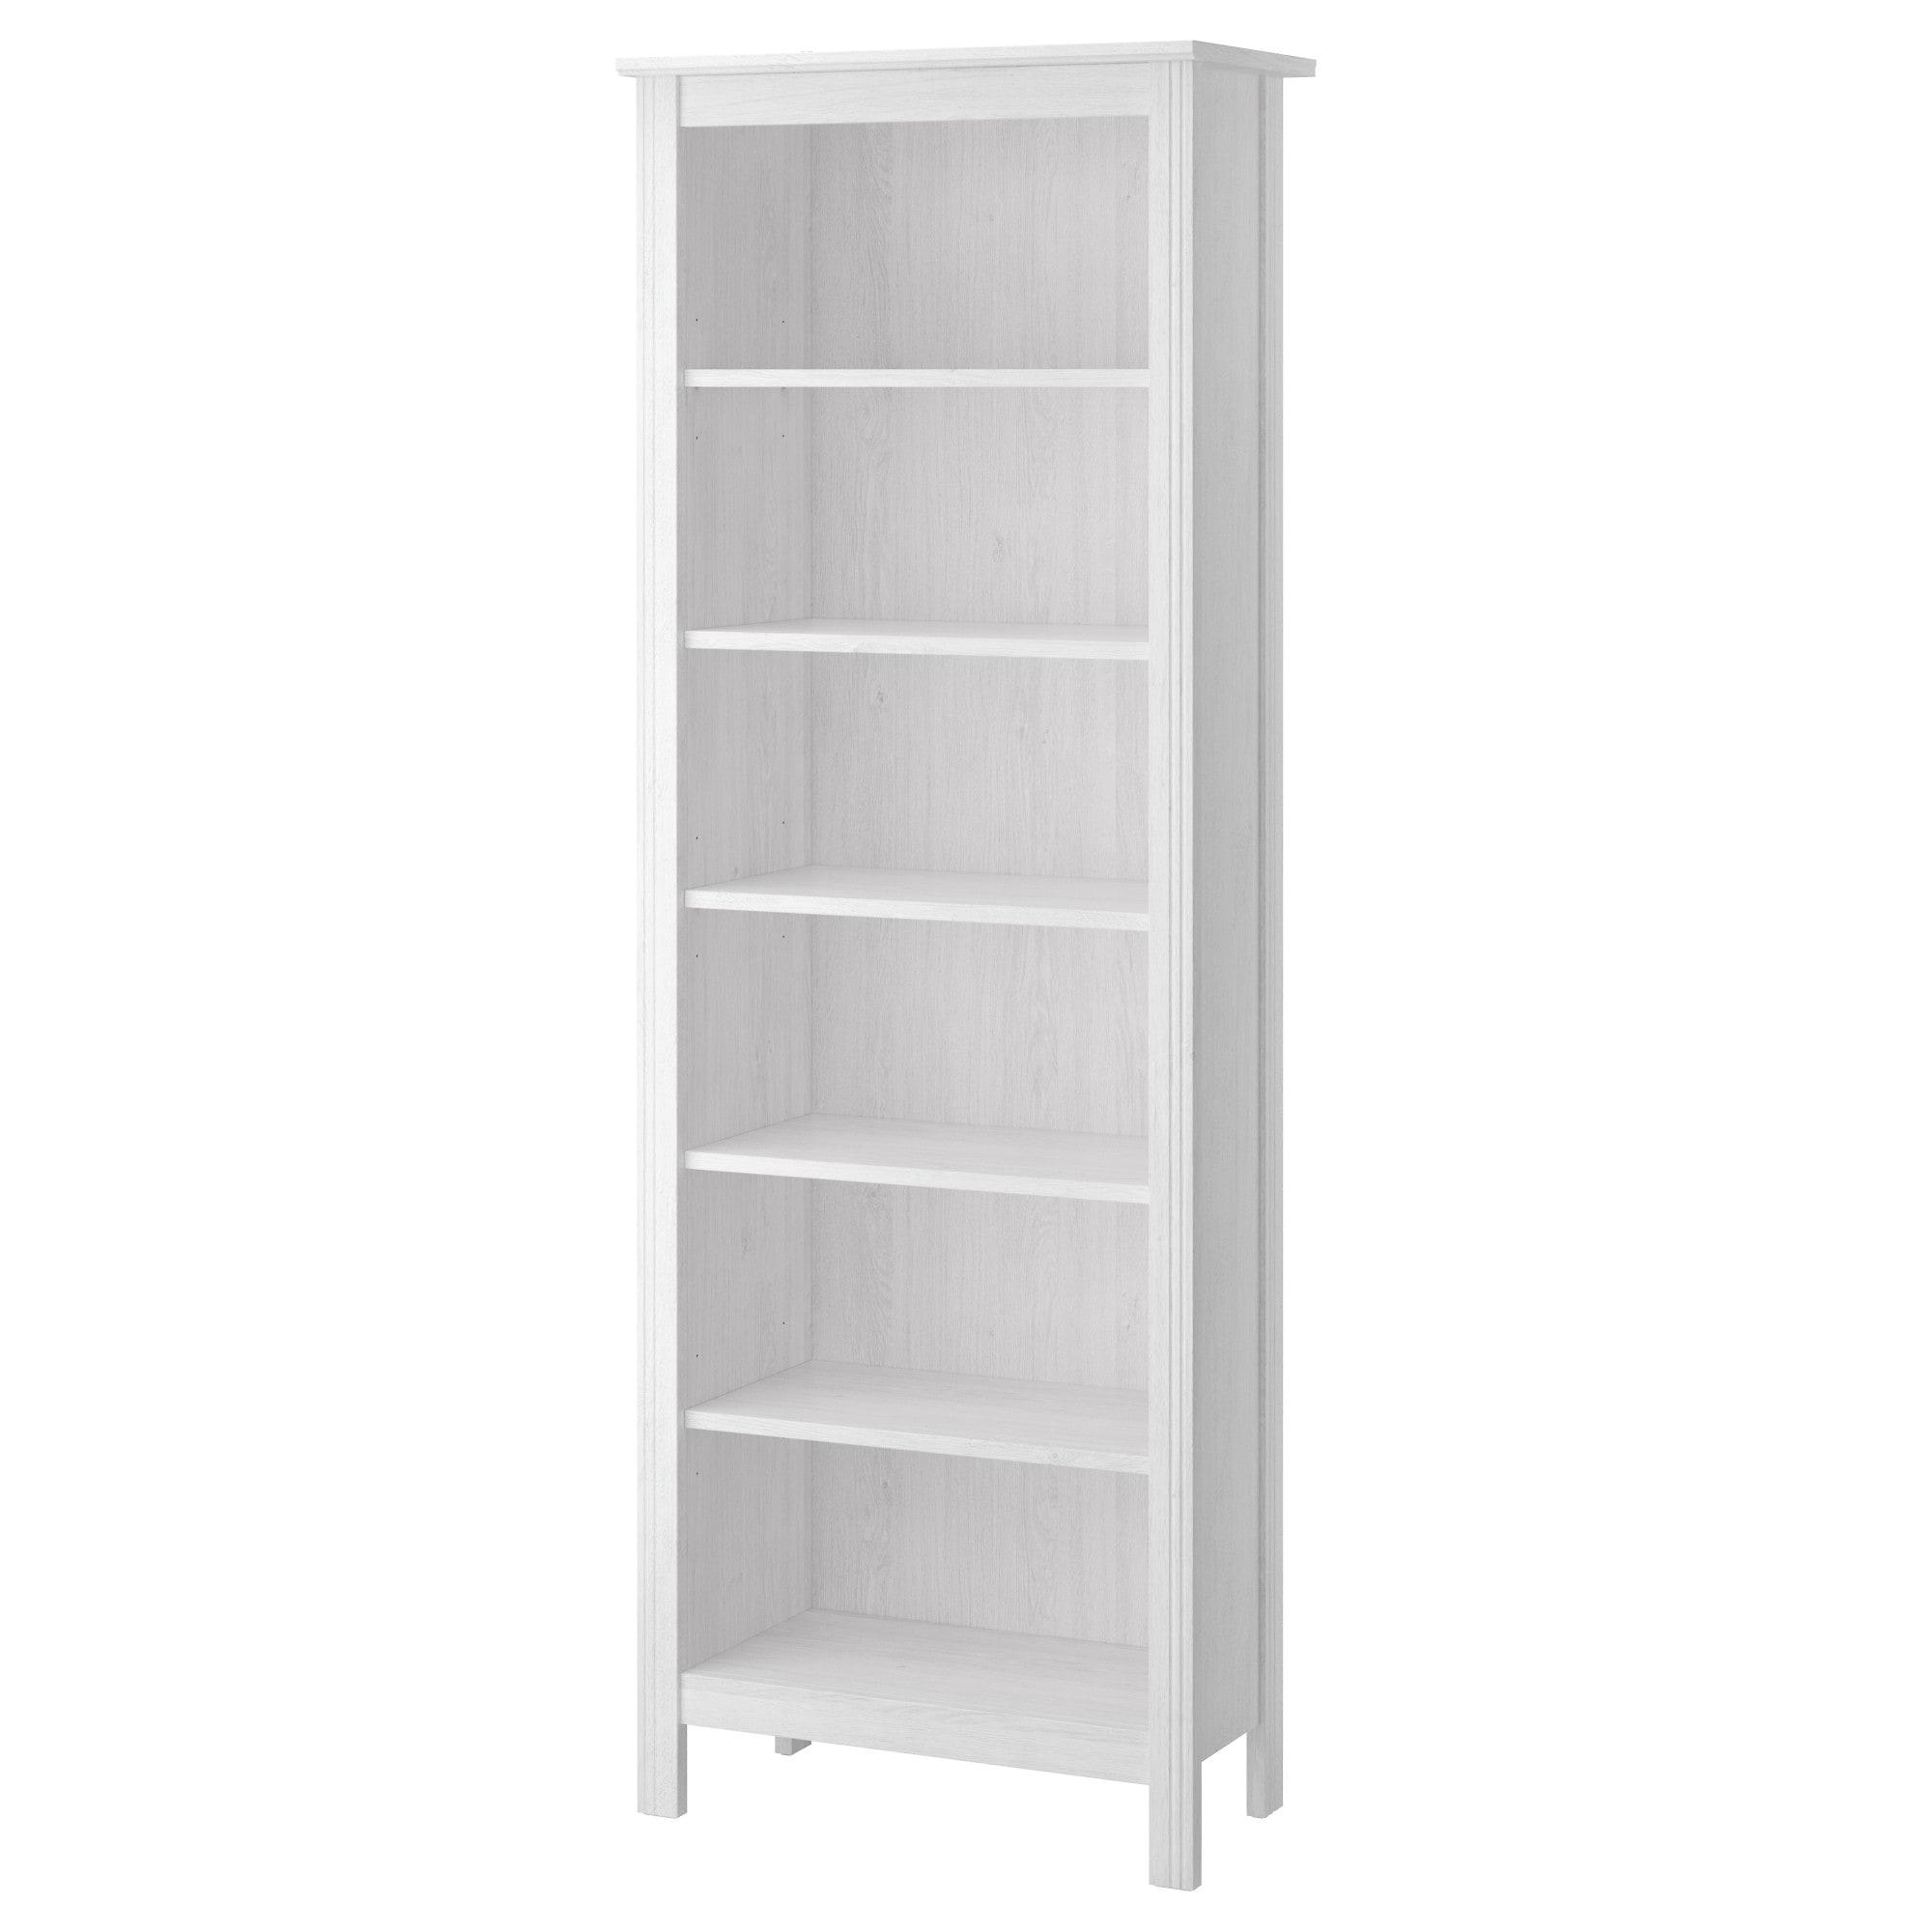 Ikea Us Furniture And Home Furnishings White Bookcase Hemnes Bookcase Ikea Brusali